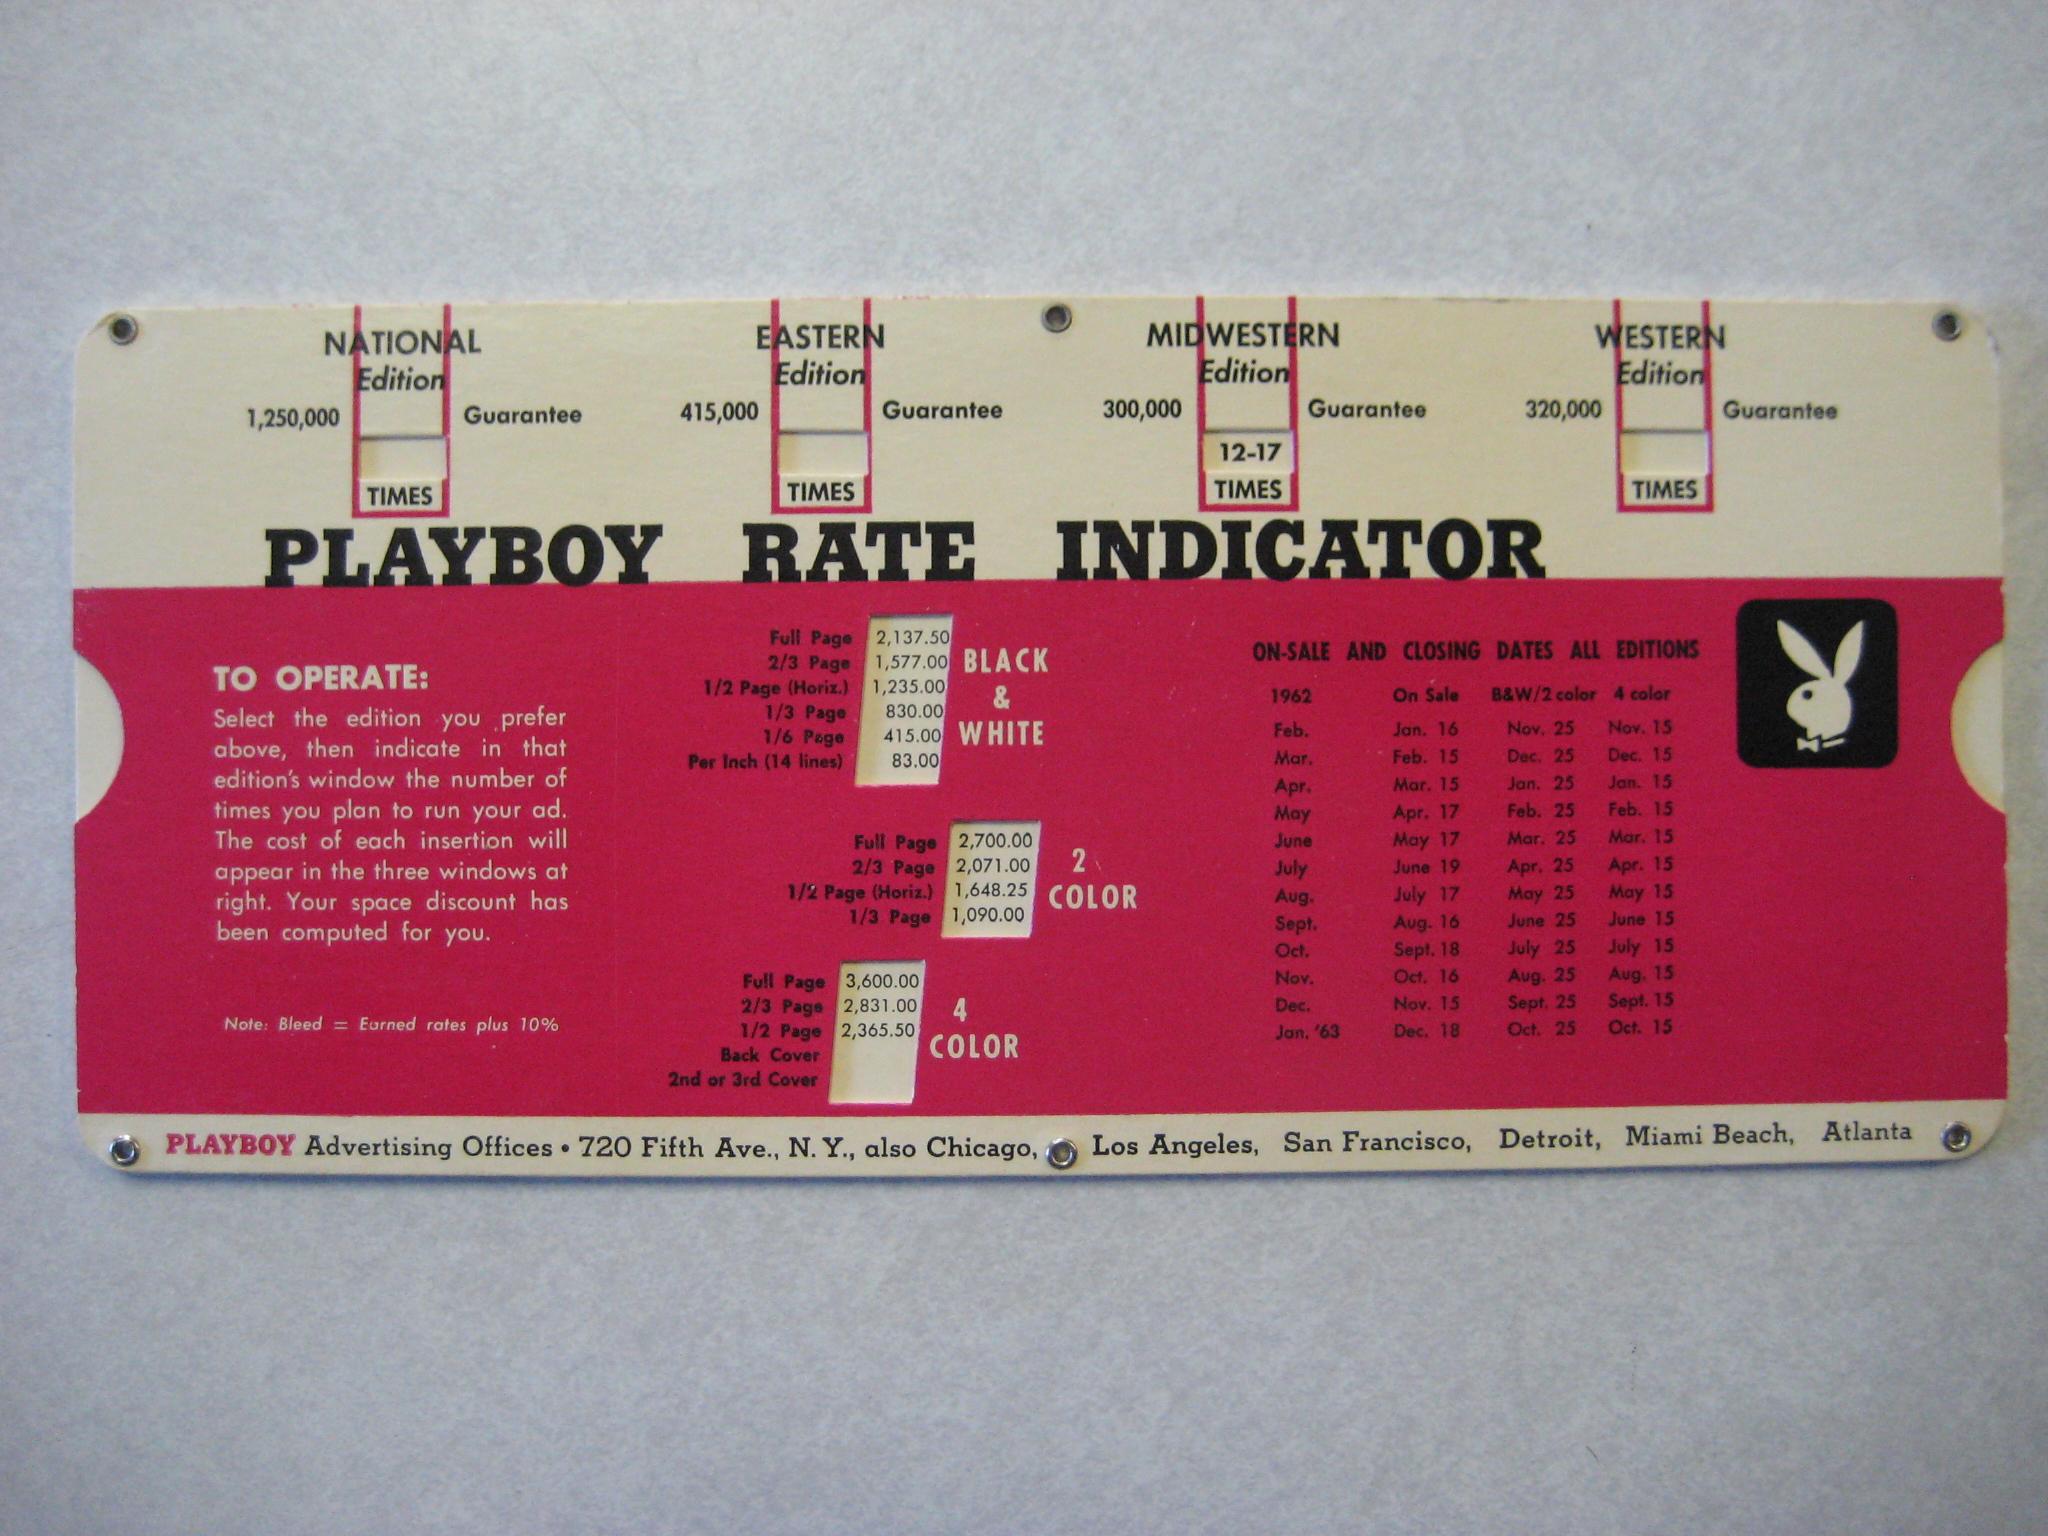 Playboy Advertising Rate Indicator 1963